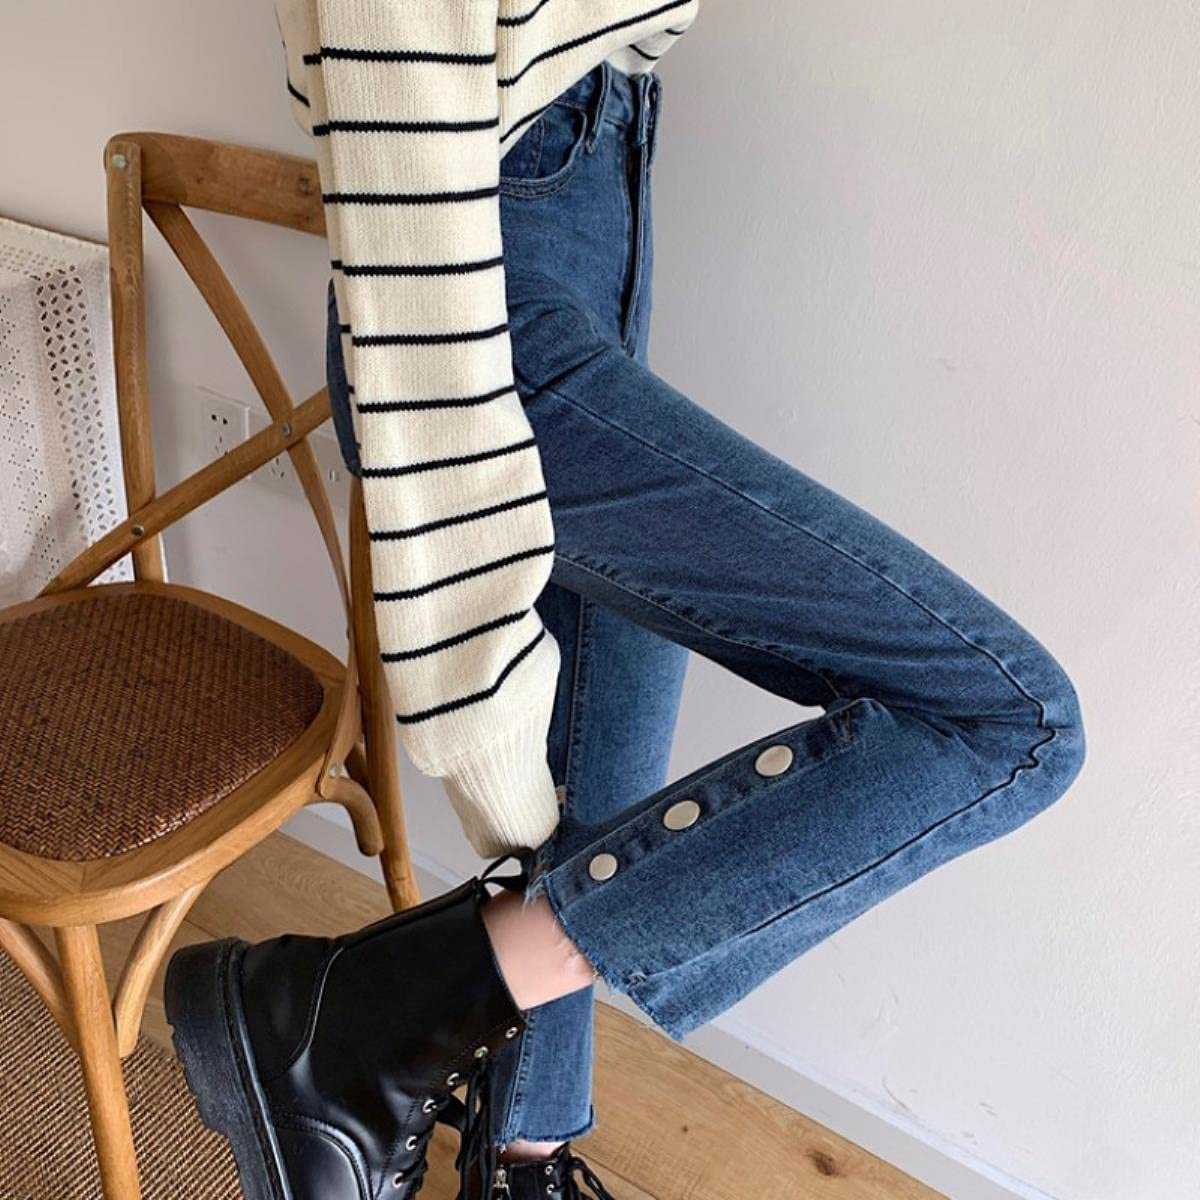 Spring 2021 New Stretchy High Waist Slimming Versatile Retro Straight-Leg Pants